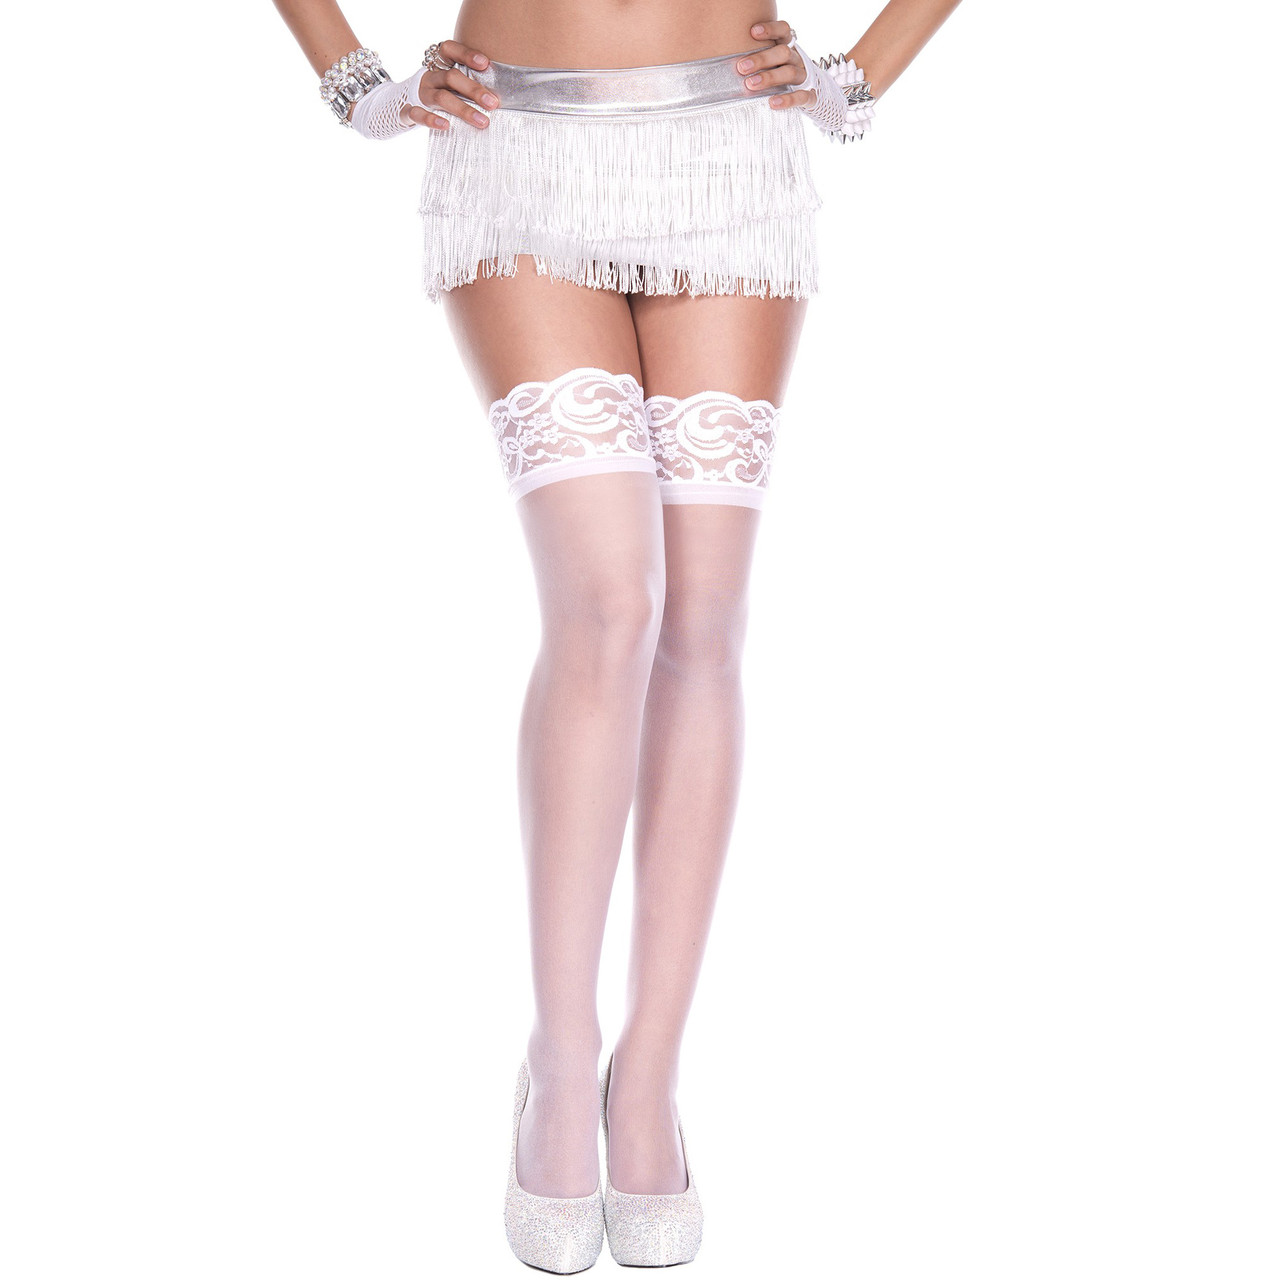 Чулки женские белые размер М